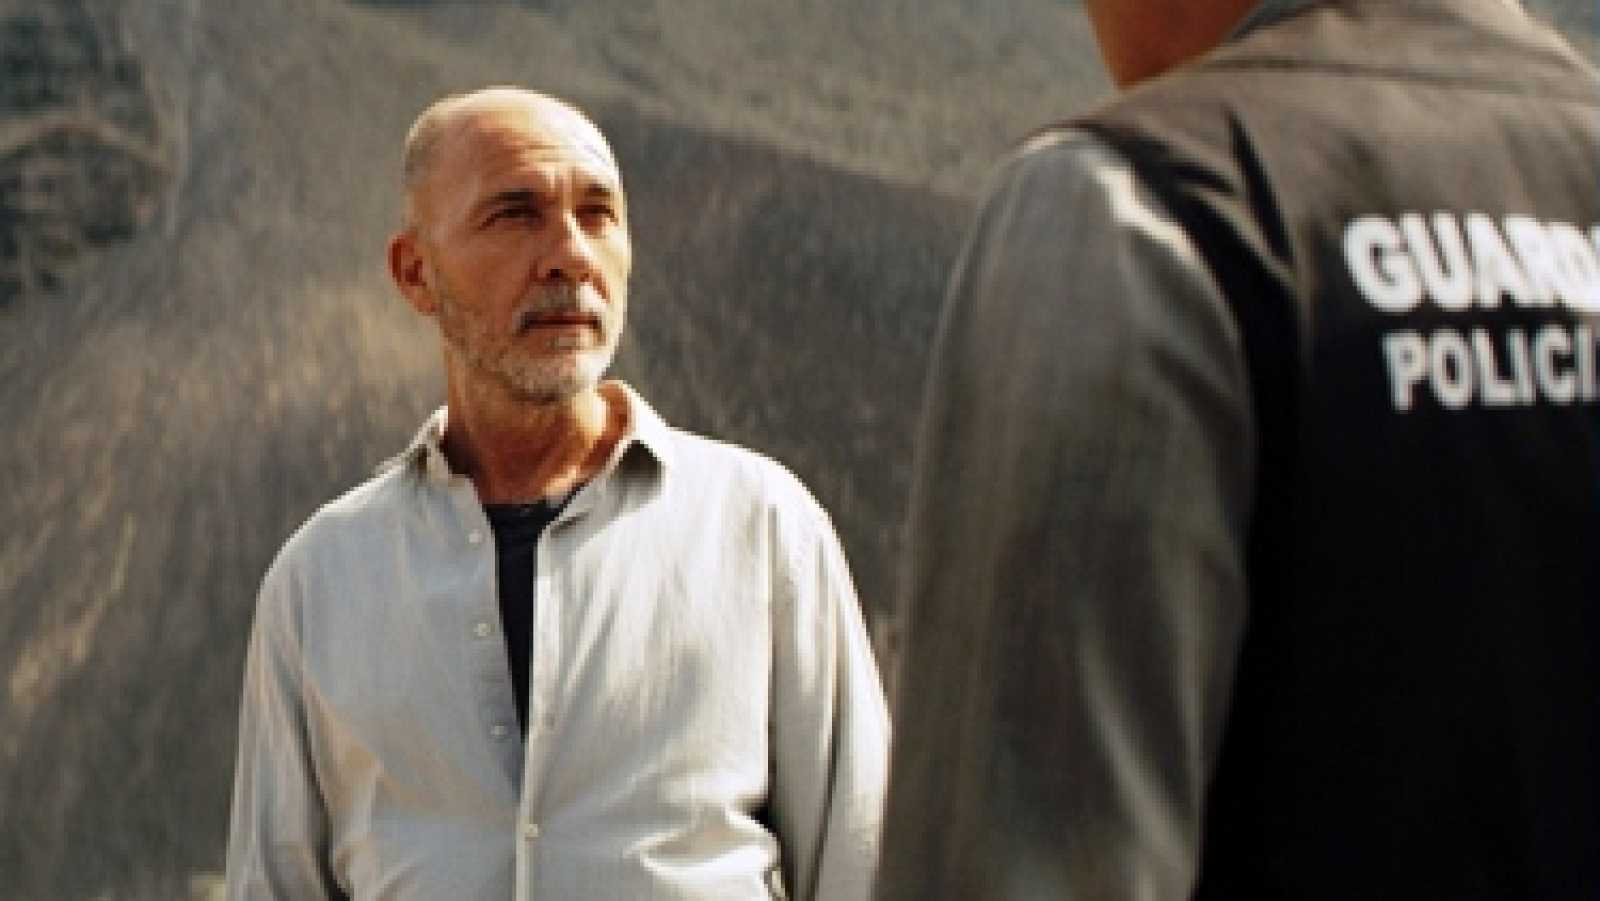 Hora América de cine - Darío Grandinetti vuelve a interpretar a Díaz en 'Hierro 2' - escuchar ahora